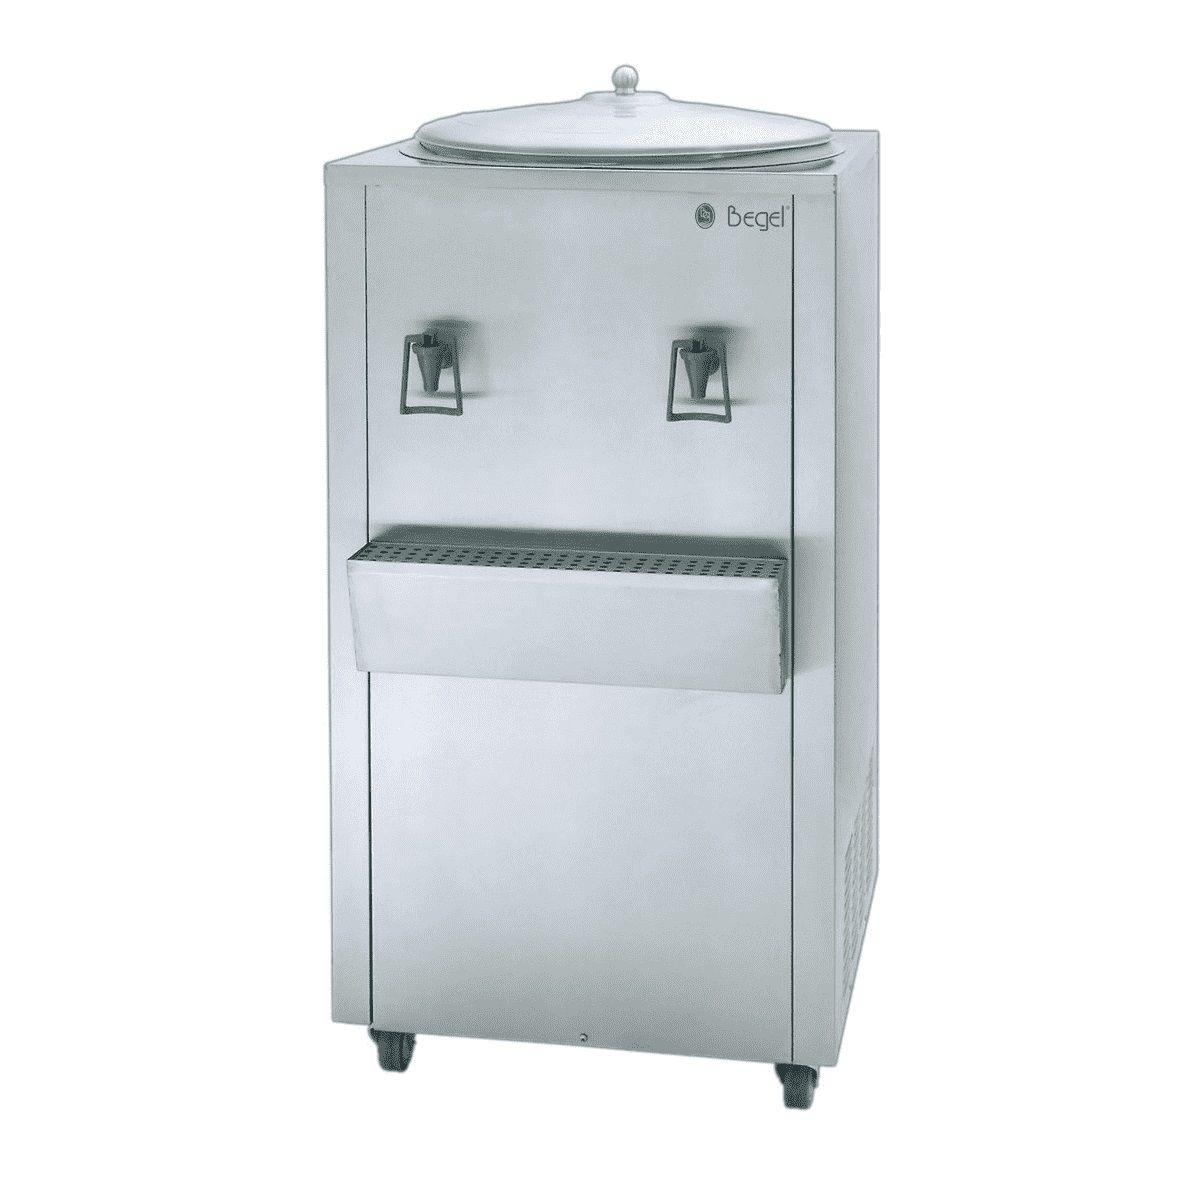 Refresqueira Industrial Begel 150 Litros - RFI150